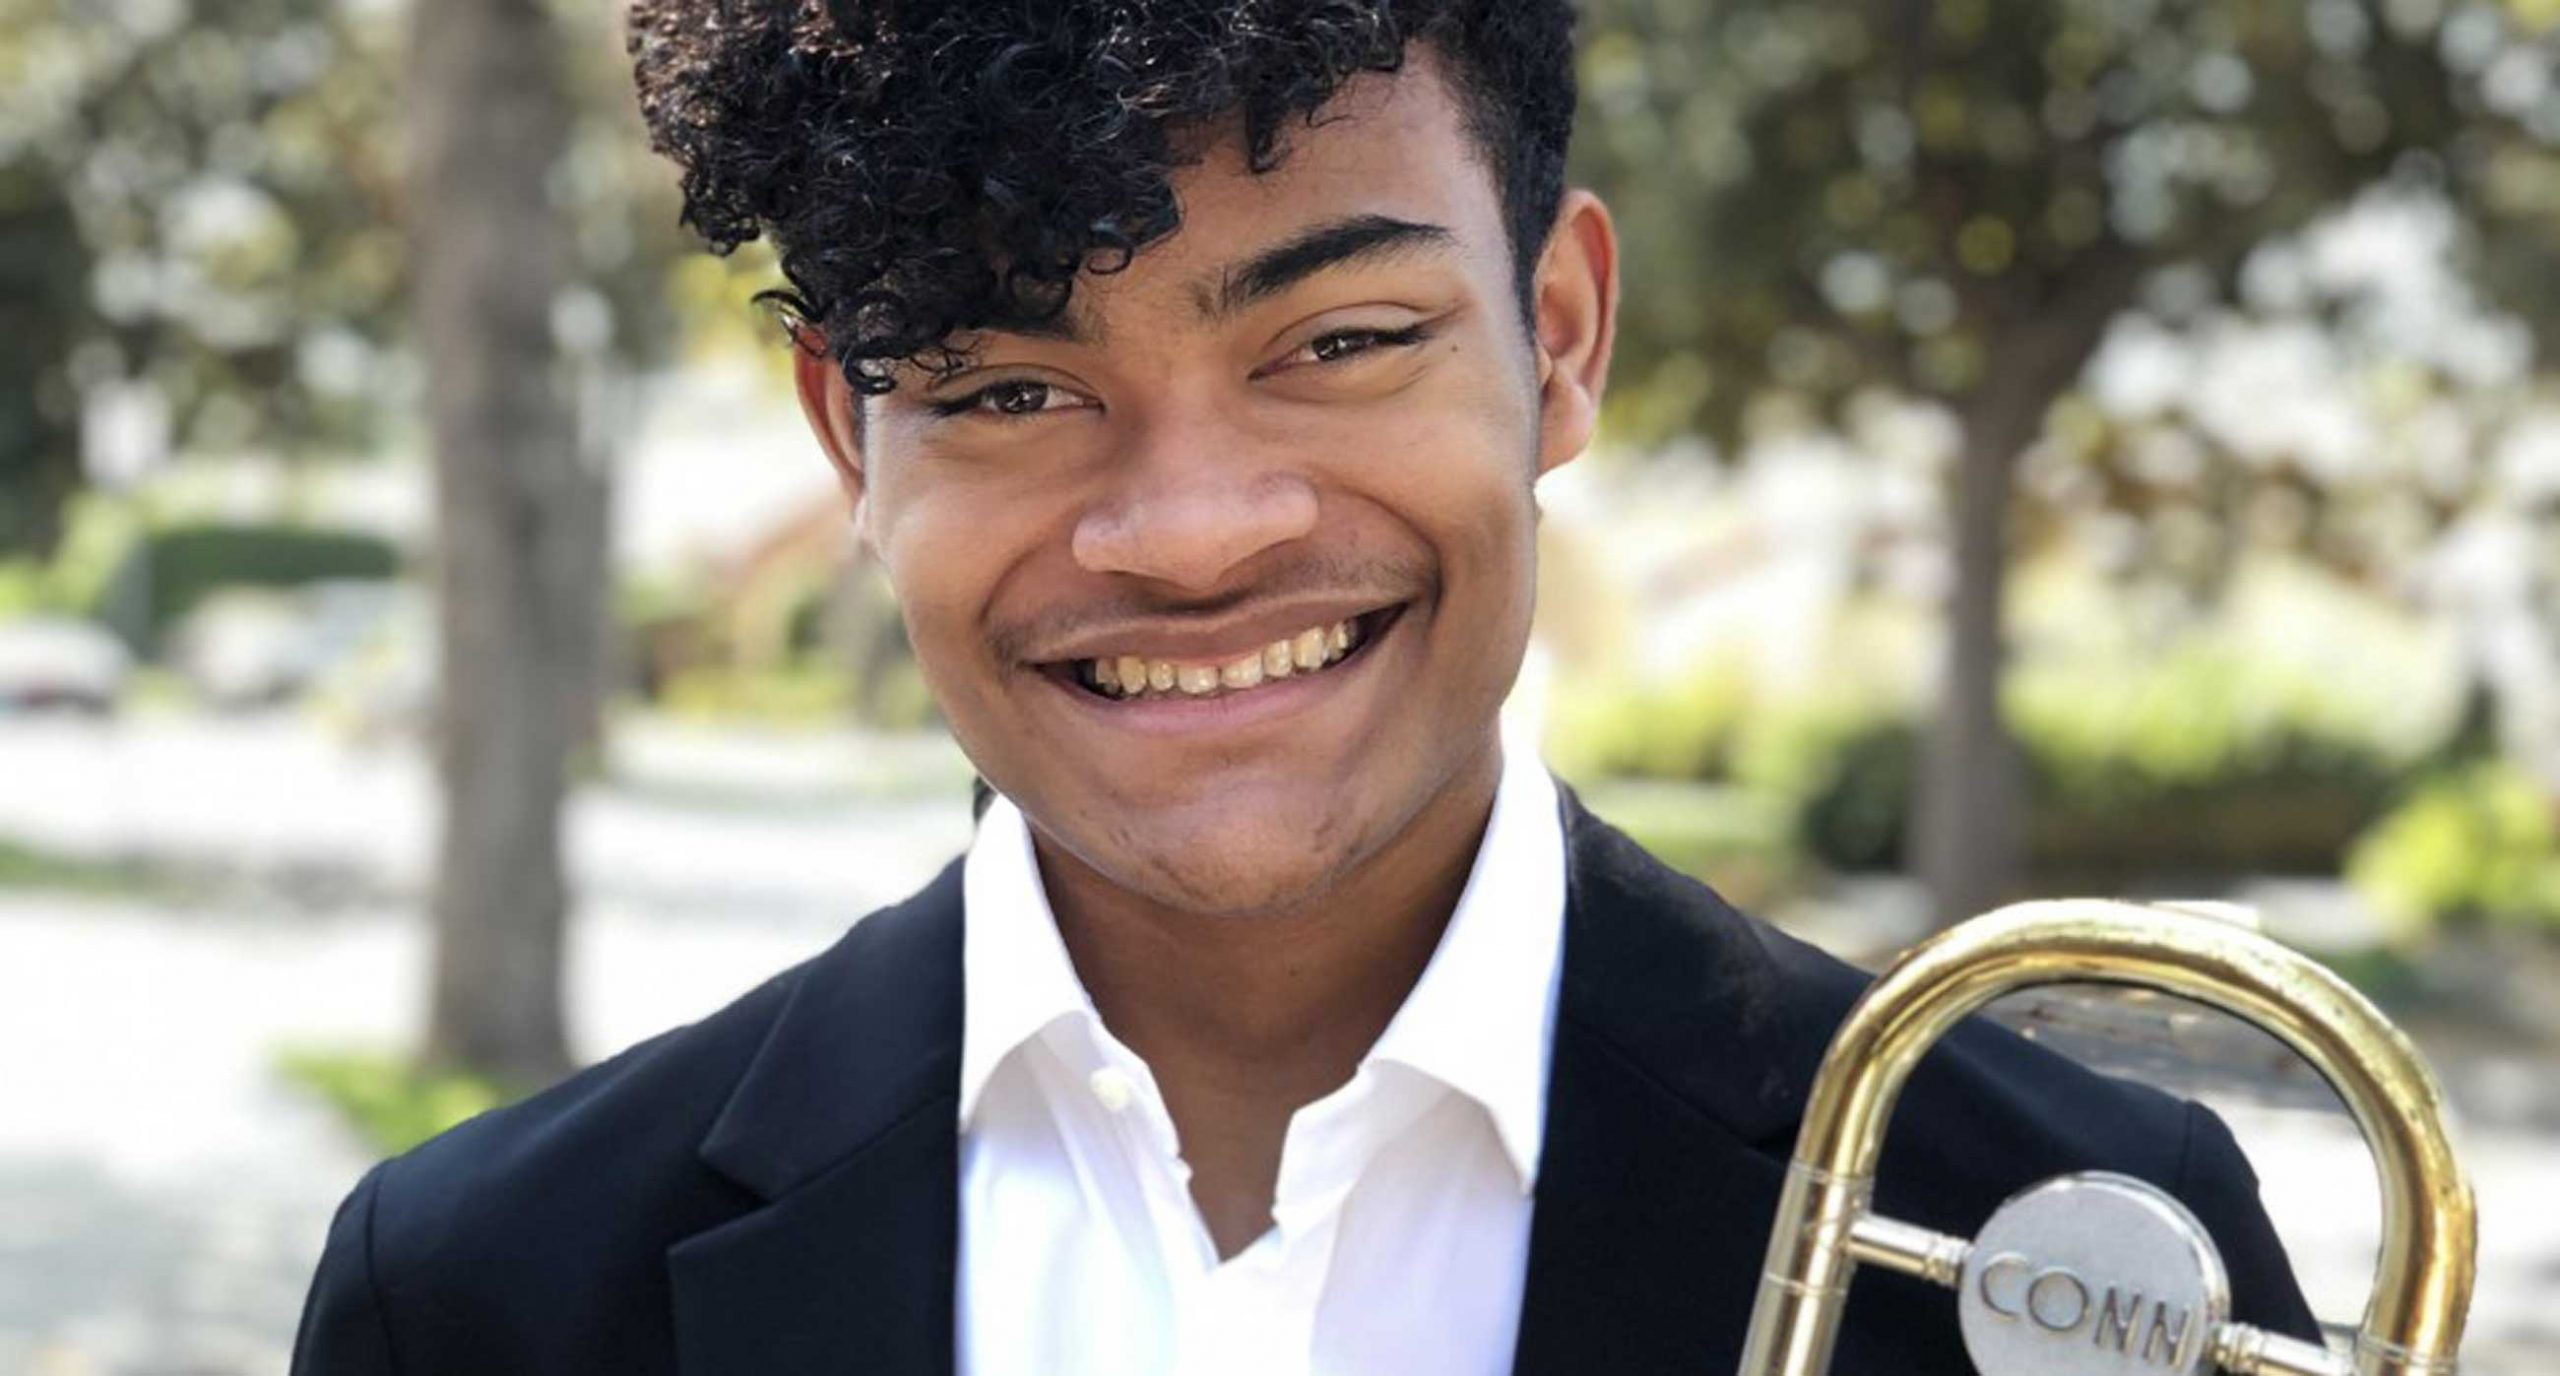 Elijah Alexander standing outside holding a trombone